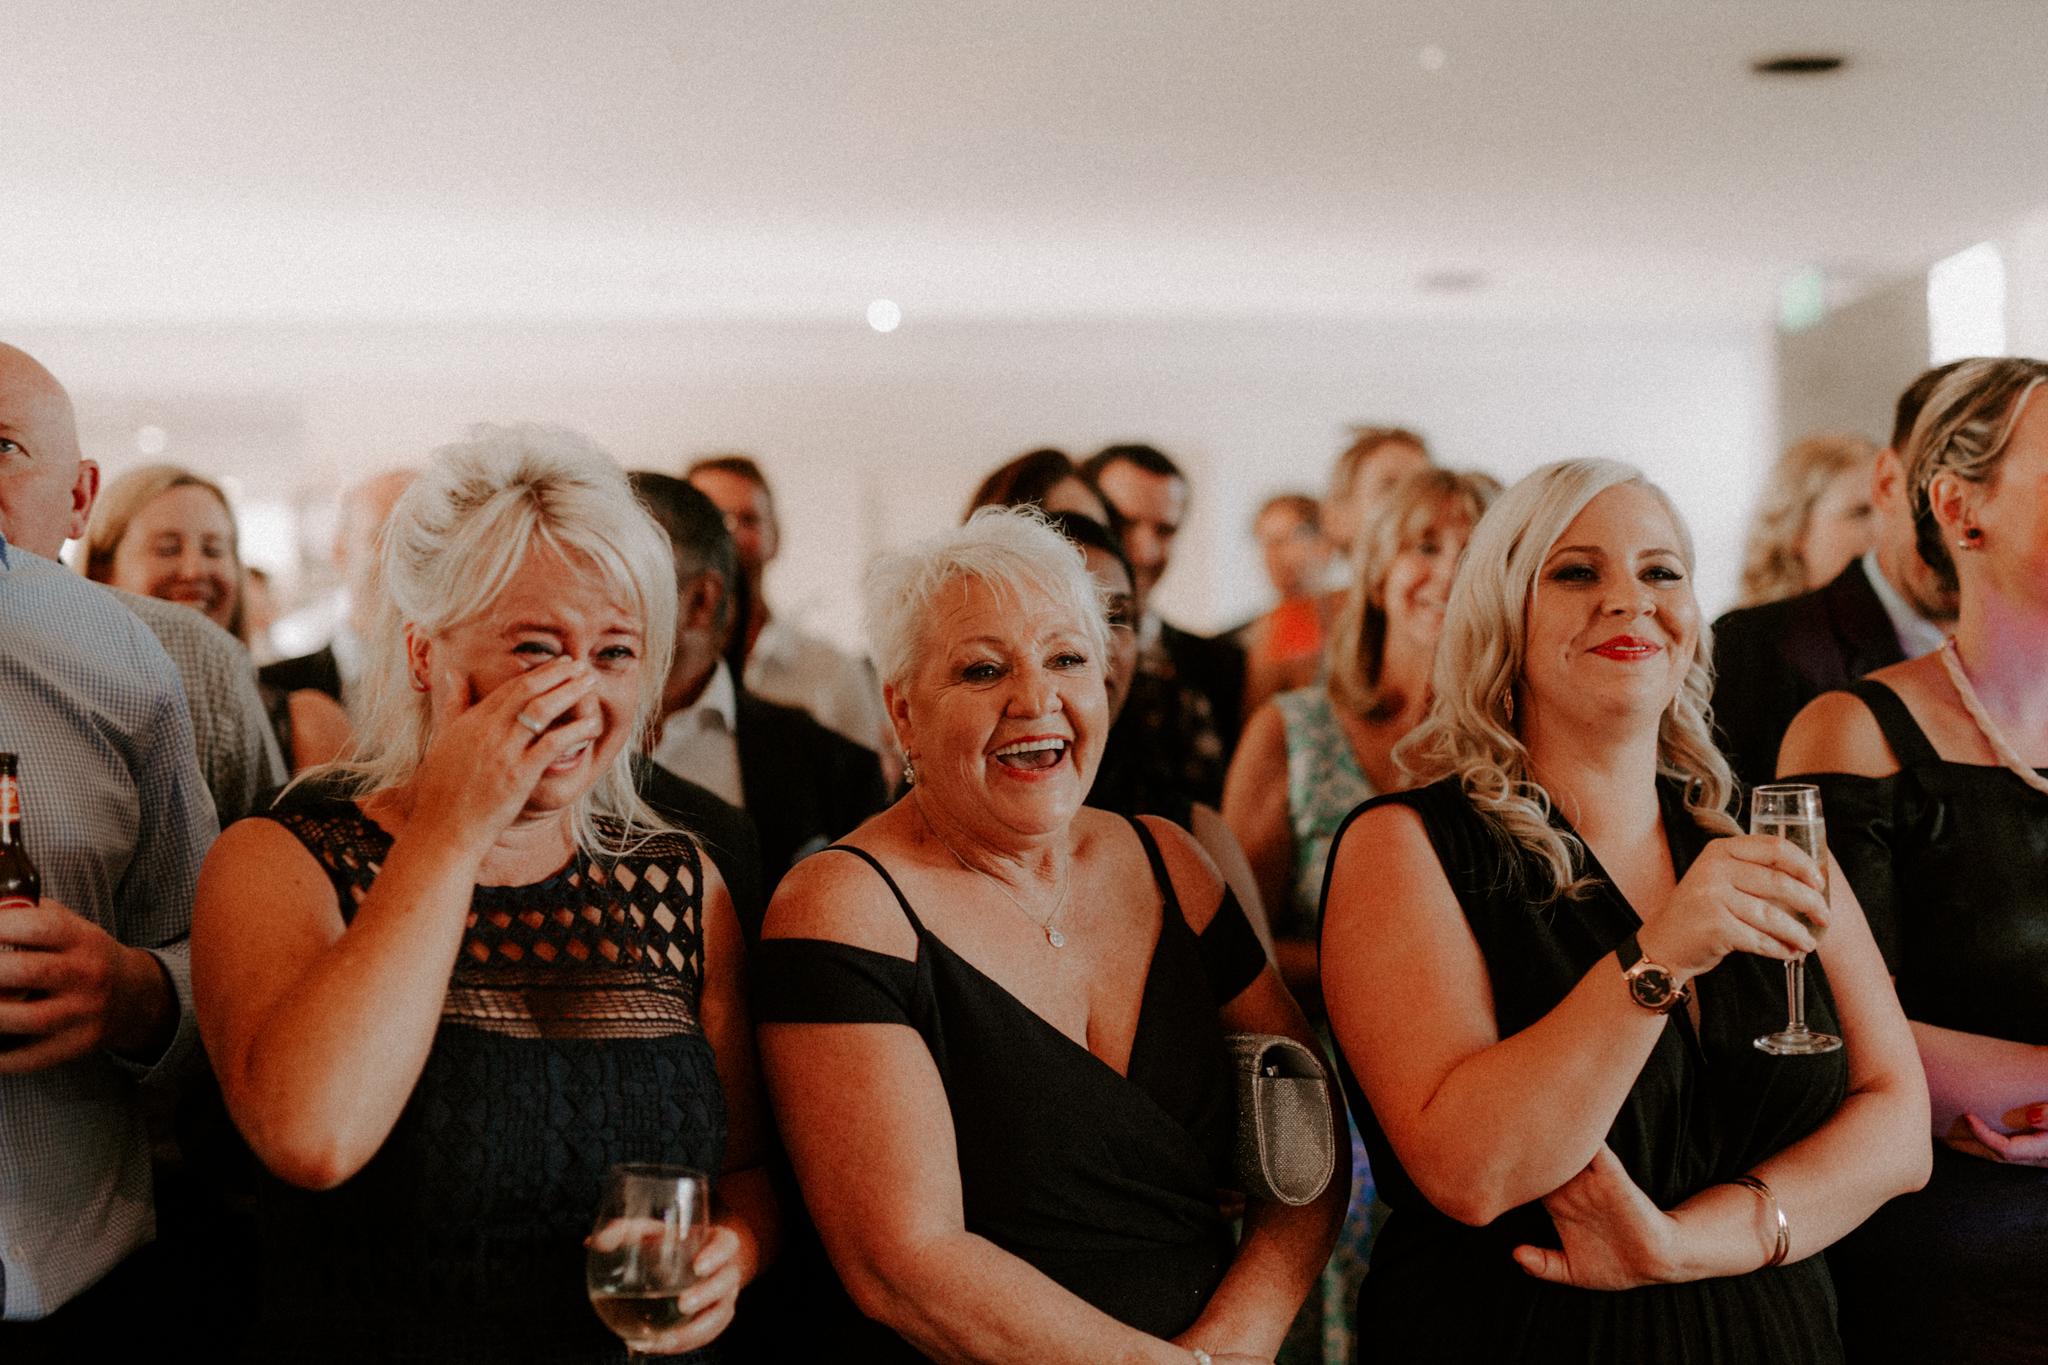 St-Kilda-Garden-Wedding-Emotions-and-Math-Photograph-188.jpg